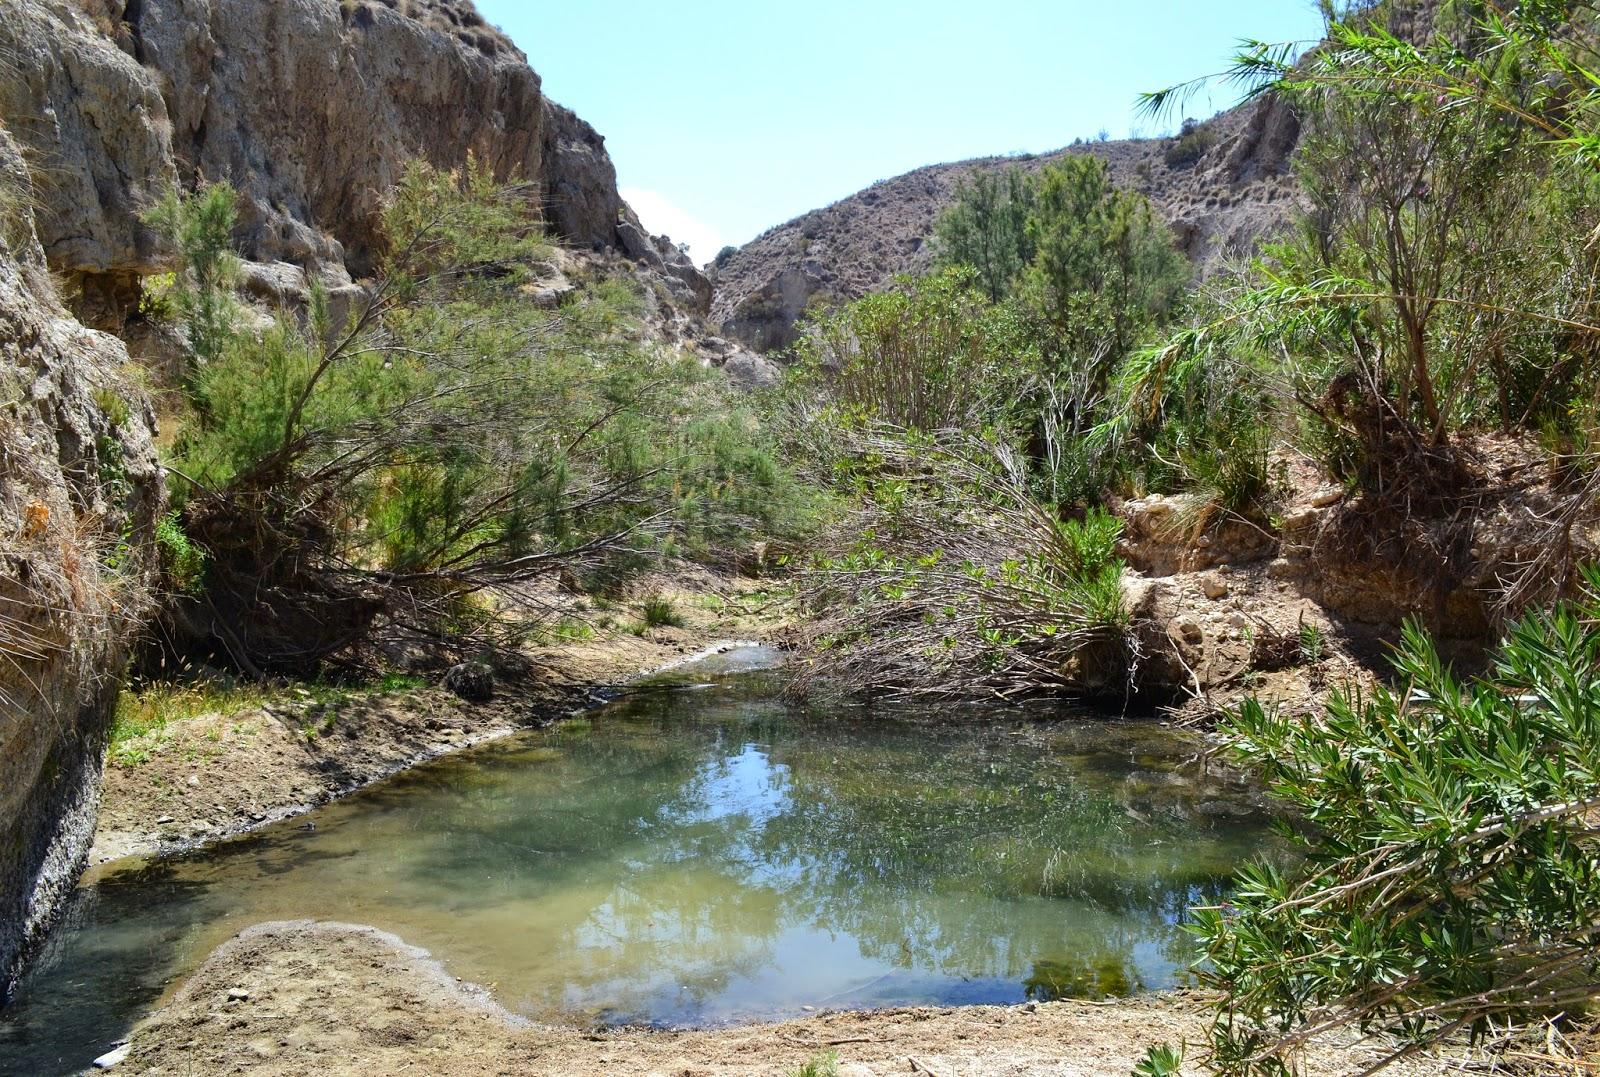 https://laotraandalucia.org/wp-content/uploads/2018/03/almer%C3%ADa-rio-aguas.jpg